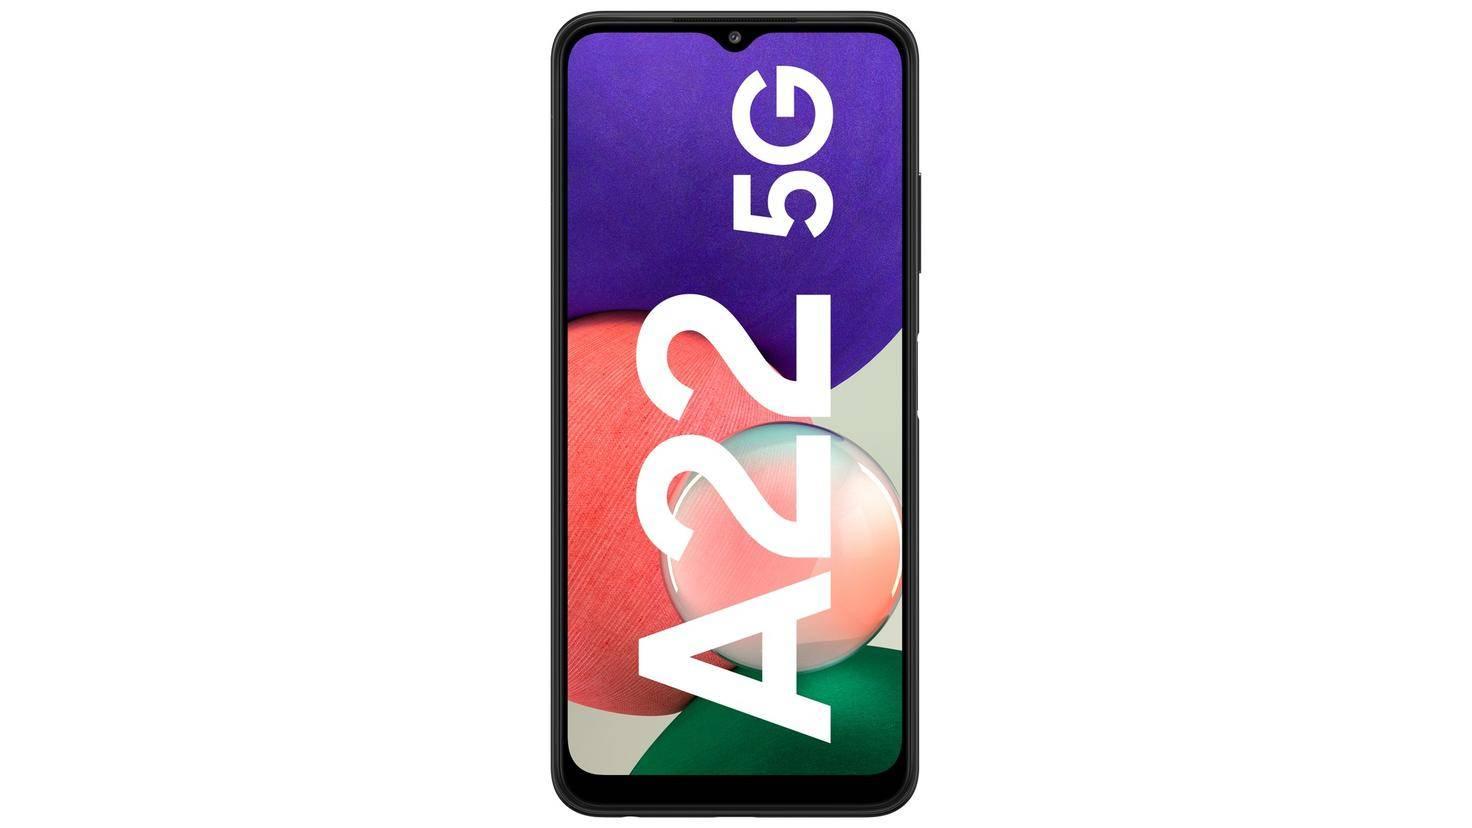 samsung-galaxy-a22-5g-smartphone